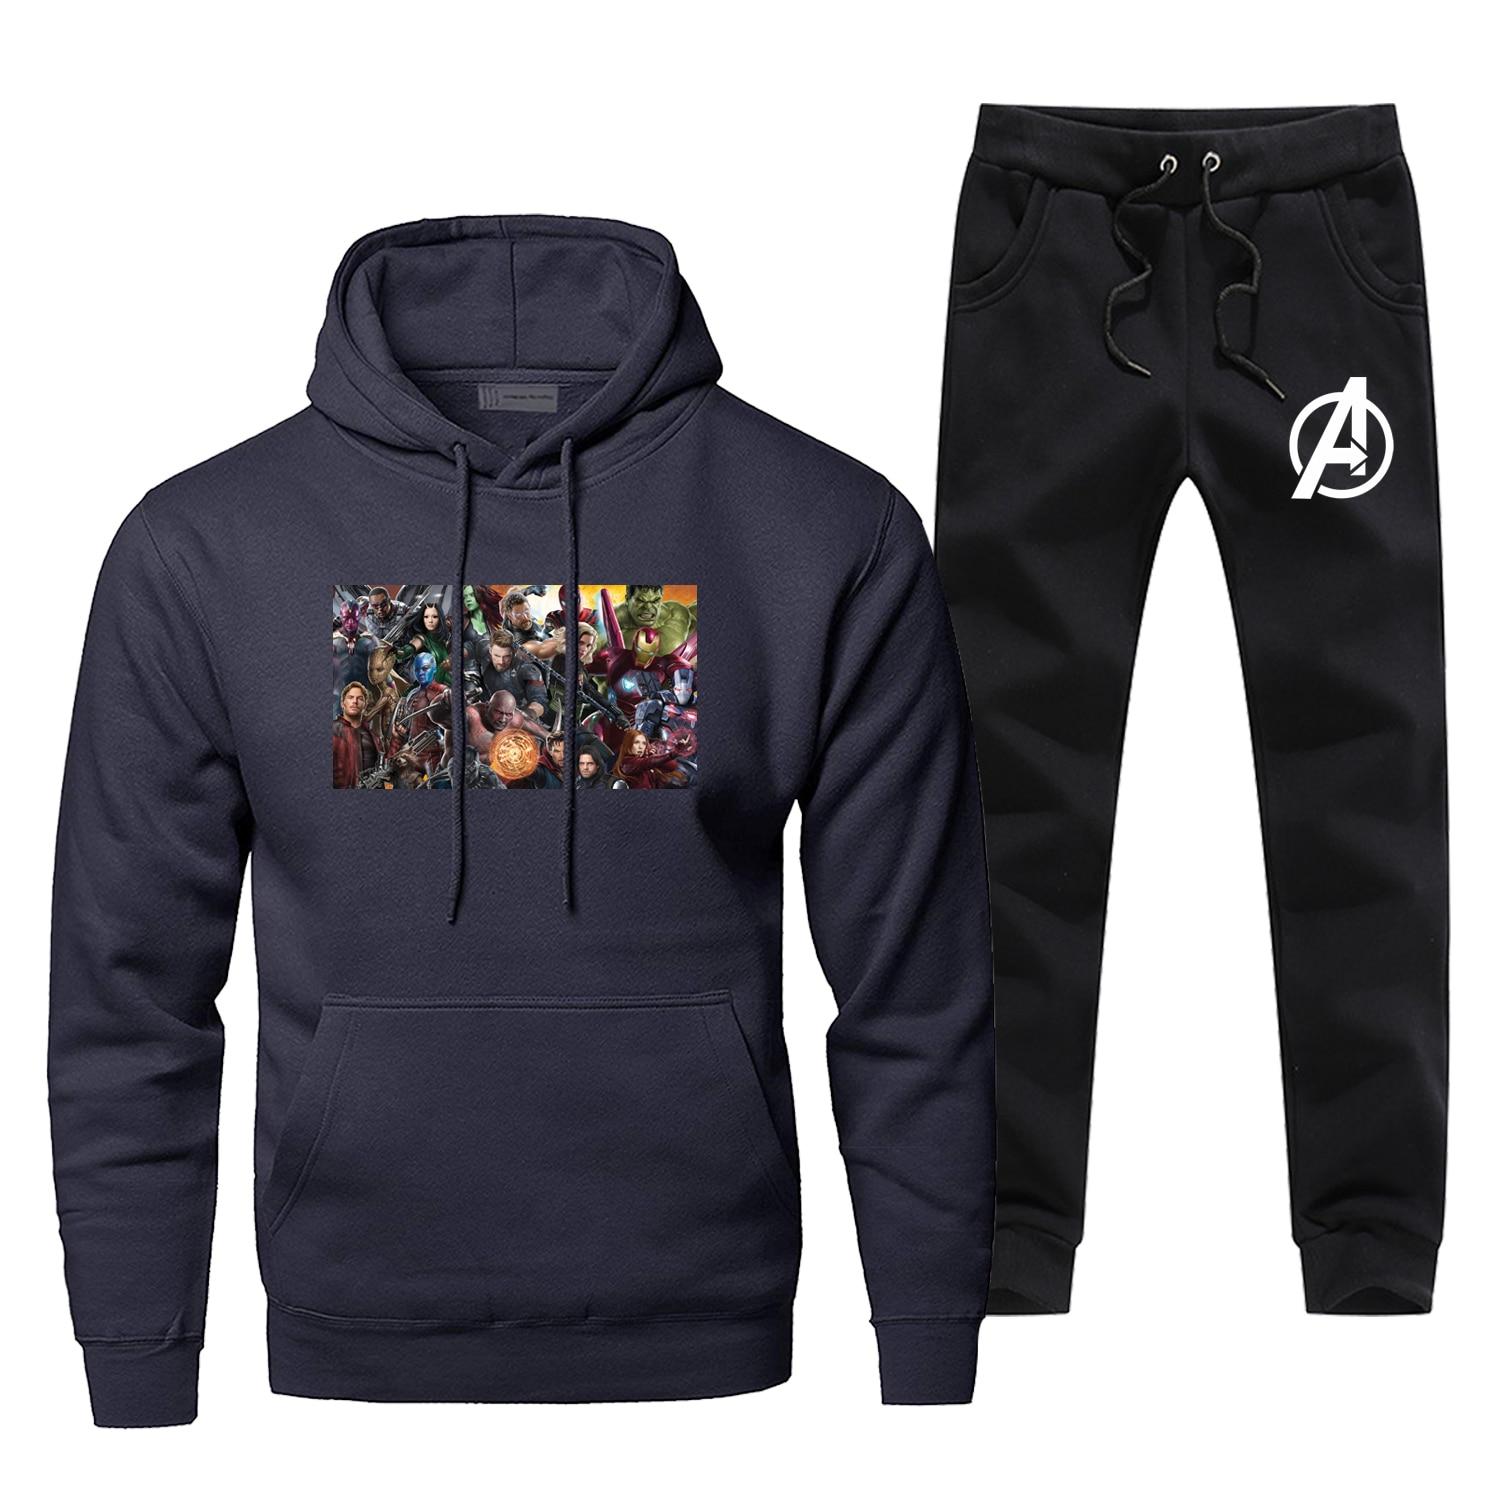 The Avengers Endgame Sportsman Wear Iron Man Super Hero Fashion Two Piece Sets End Game Casual Fitness Skateboard Warm Male Set